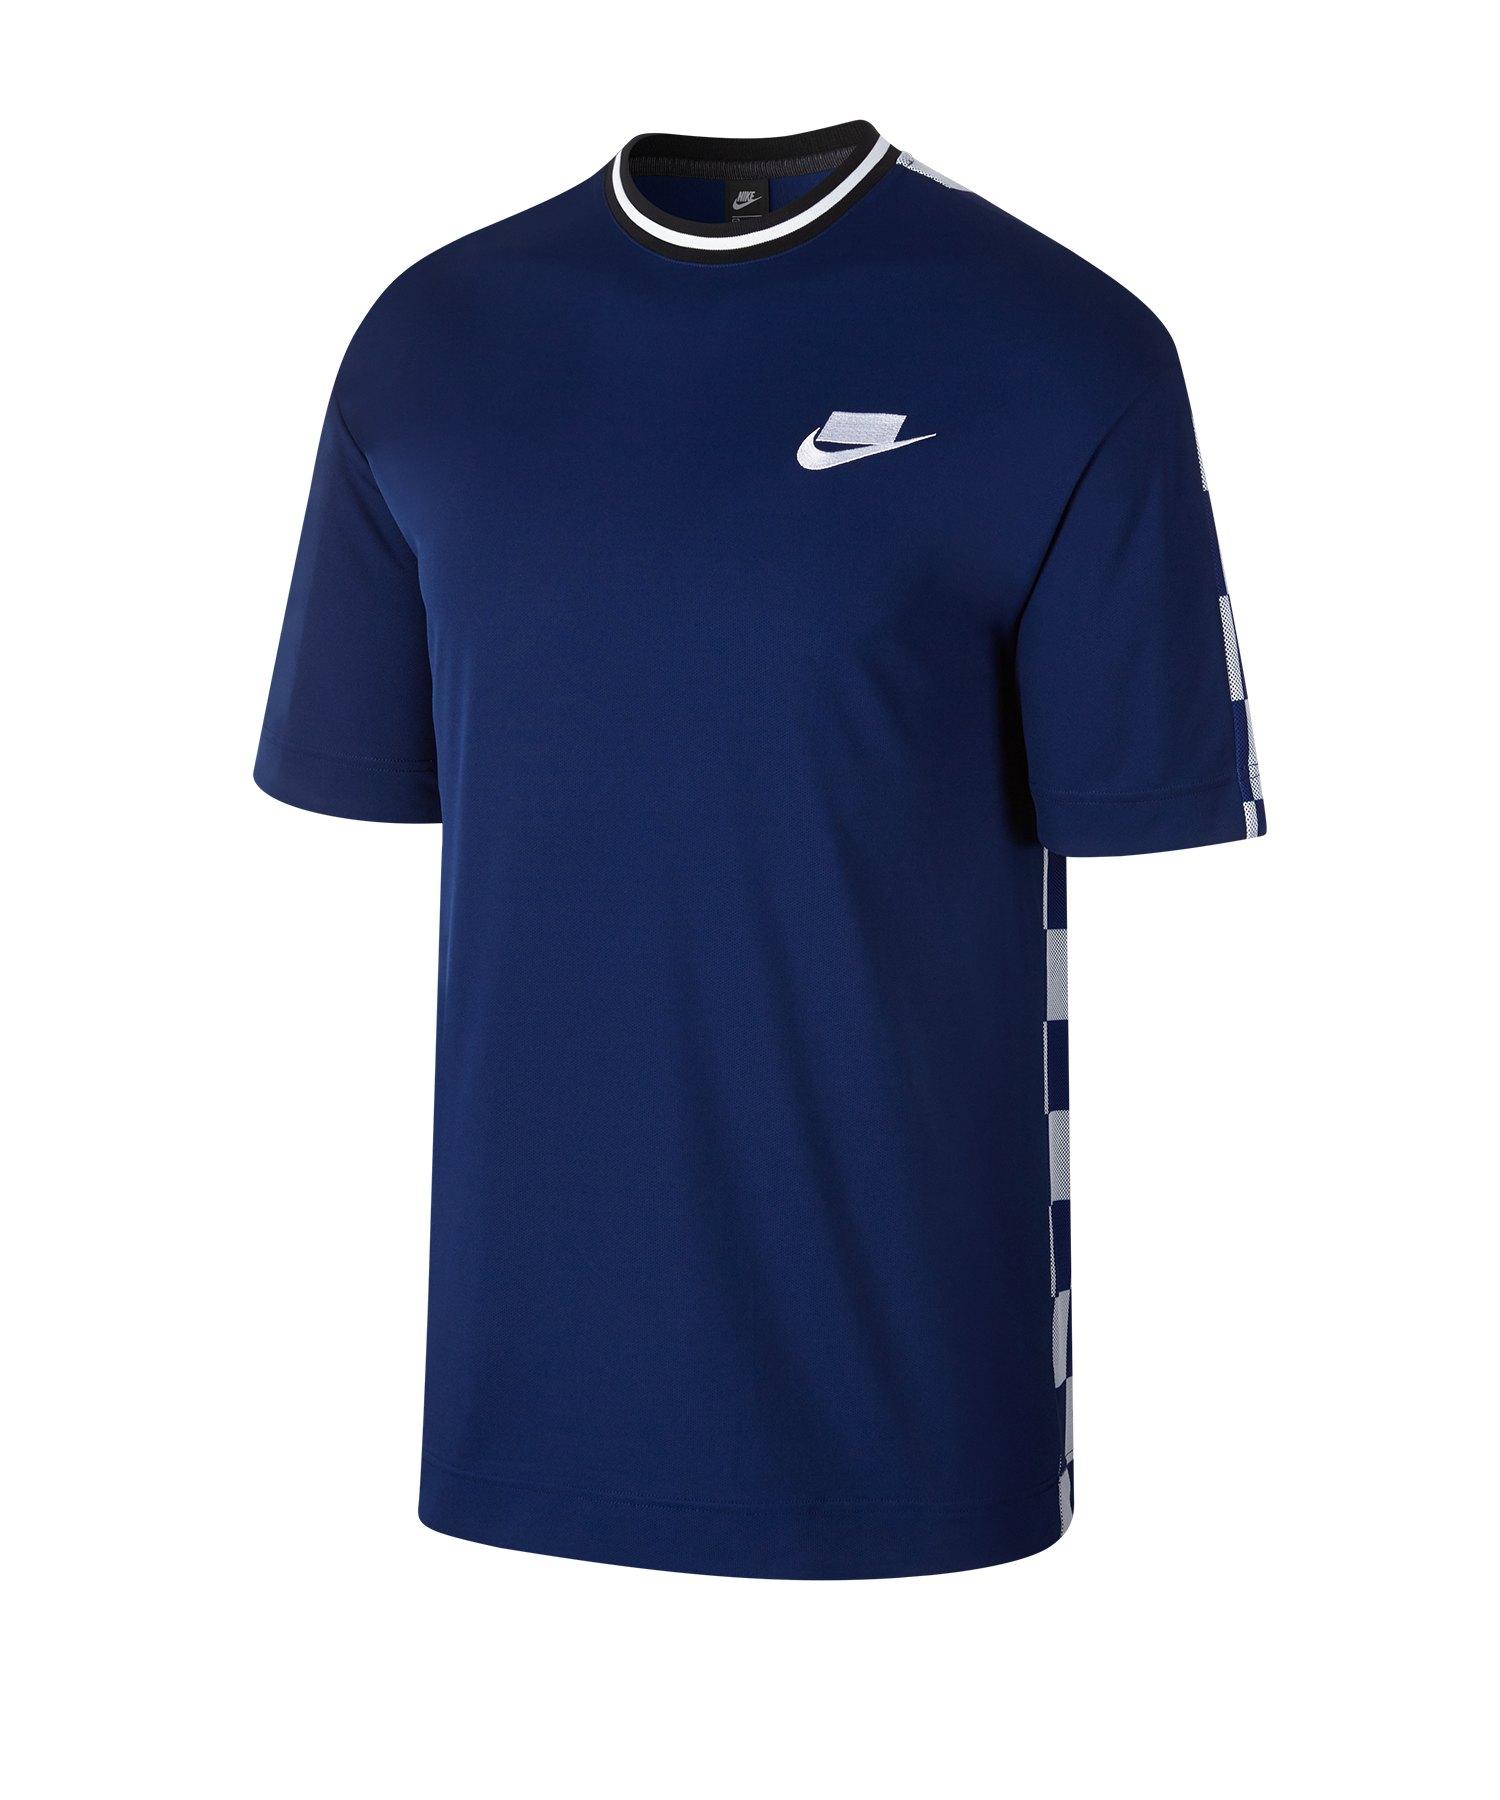 Nike Check Tee T-Shirt Blau Weiss F492 - Blau